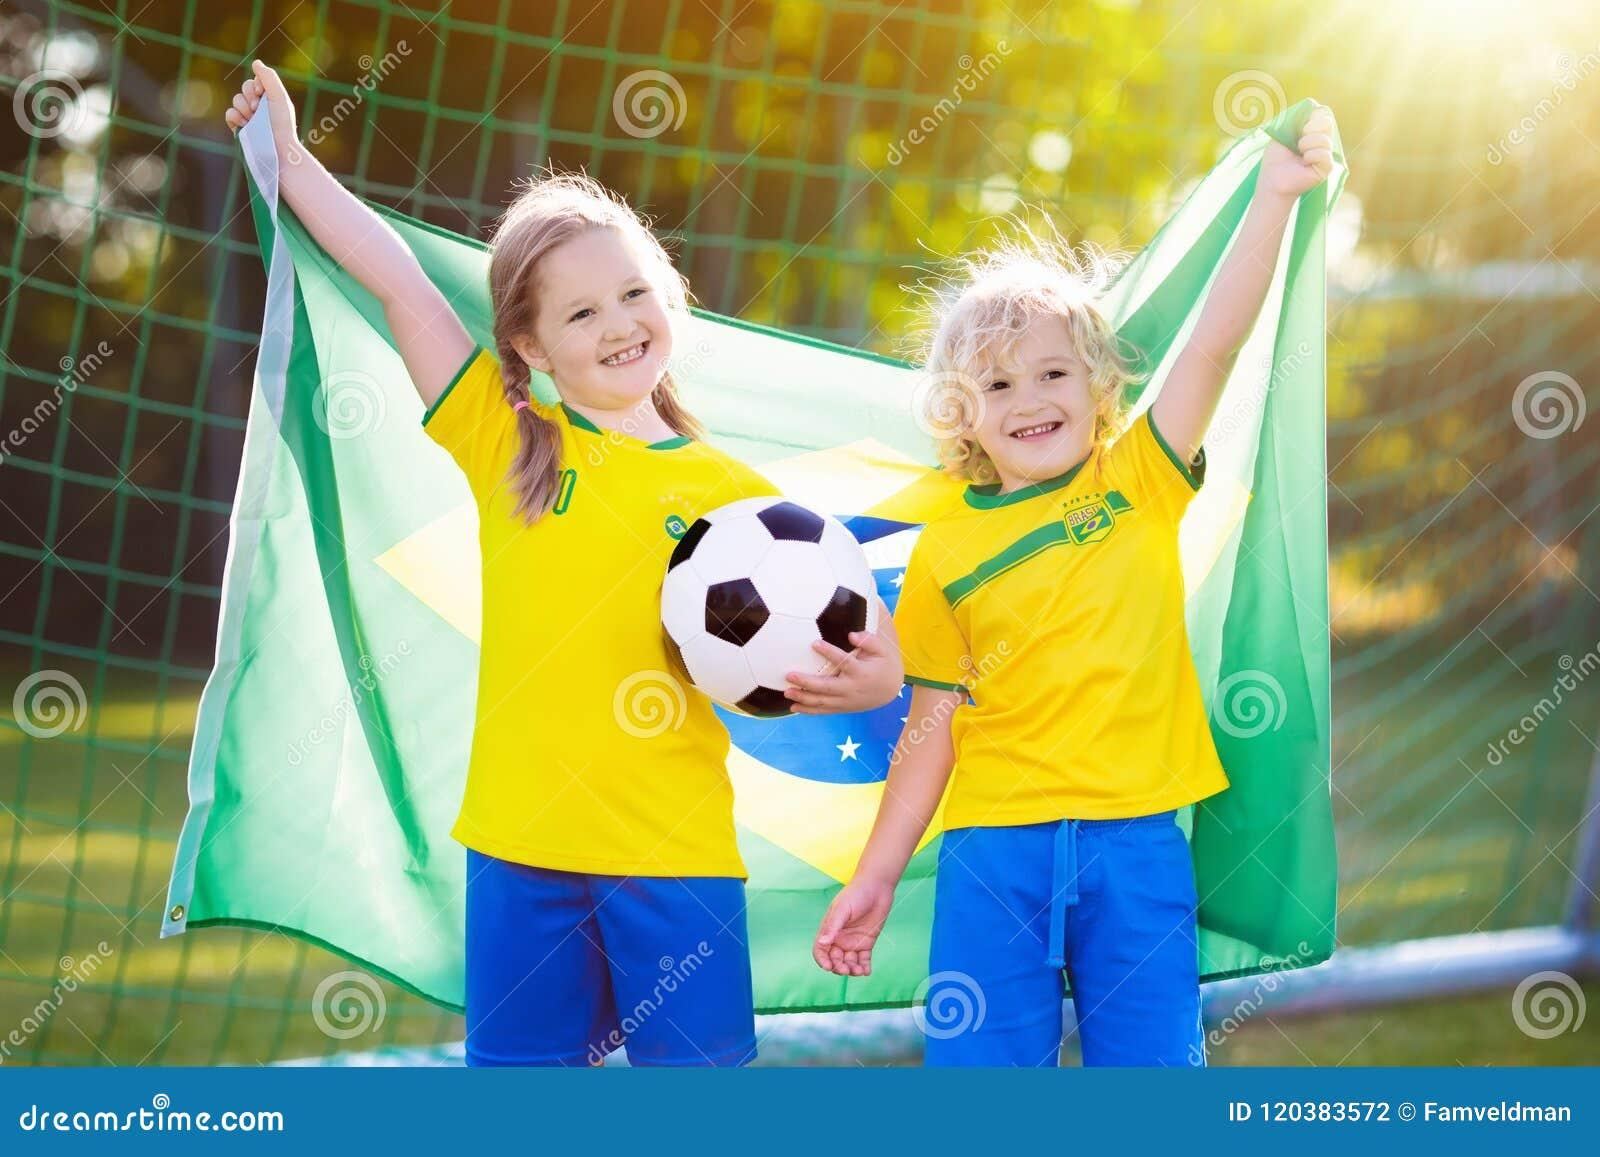 Mexico Soccer Team 2016 Football Fans Toddler//Kids Sweatshirts Gift Idea